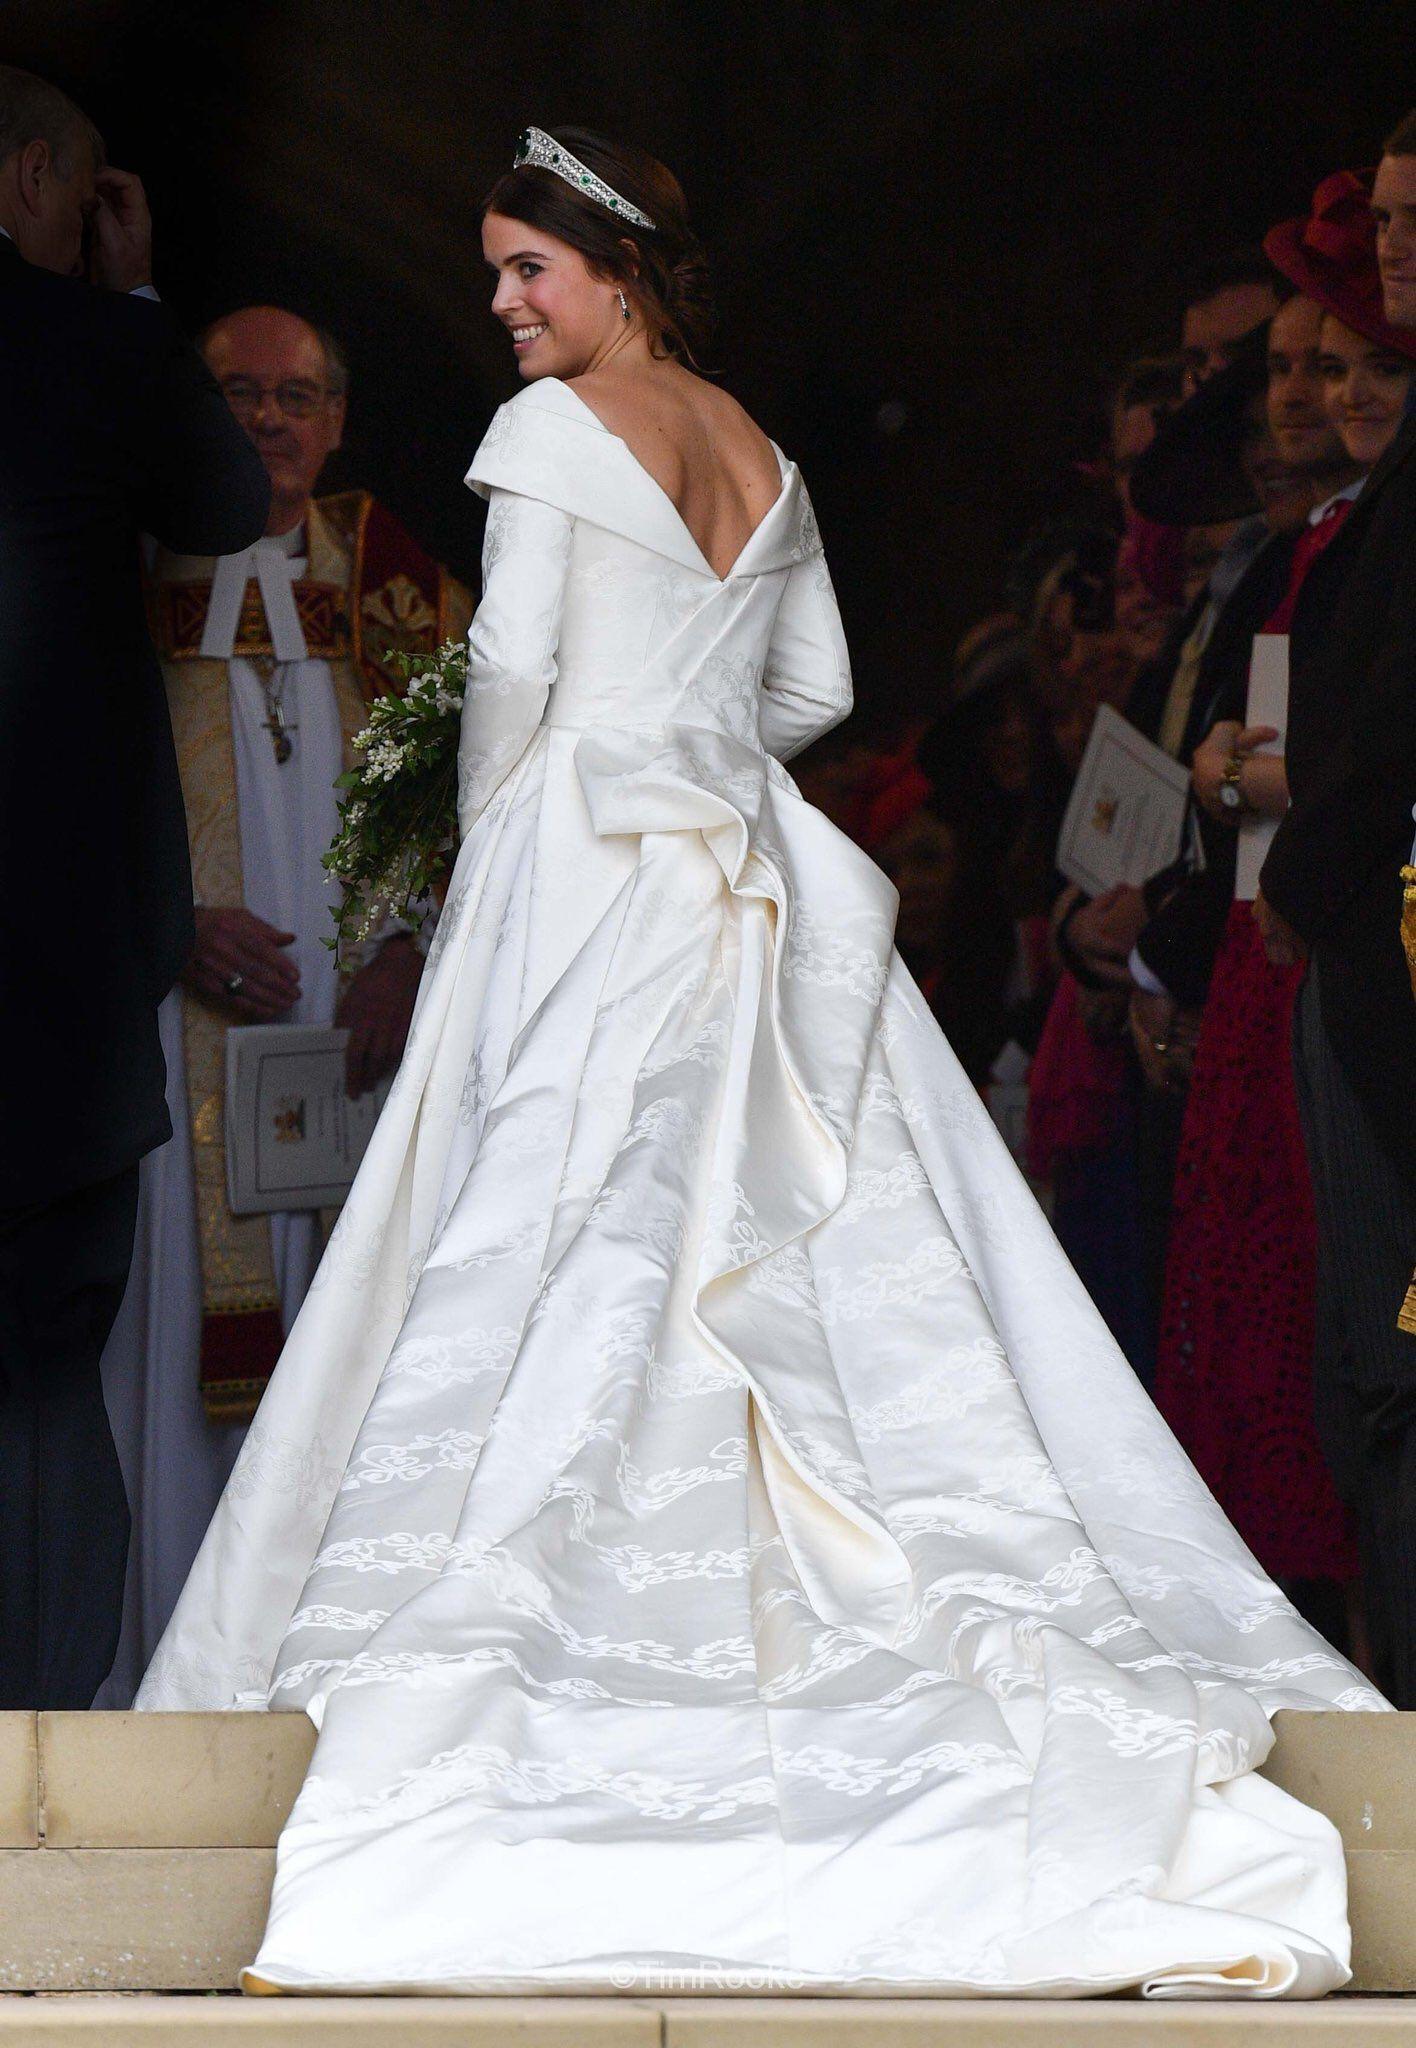 Princess Eugenie Queens Elizabeth S Granddaughter On Her Wedding Day Royal Wedding Dress Royal Wedding Gowns Eugenie Wedding [ 2048 x 1416 Pixel ]